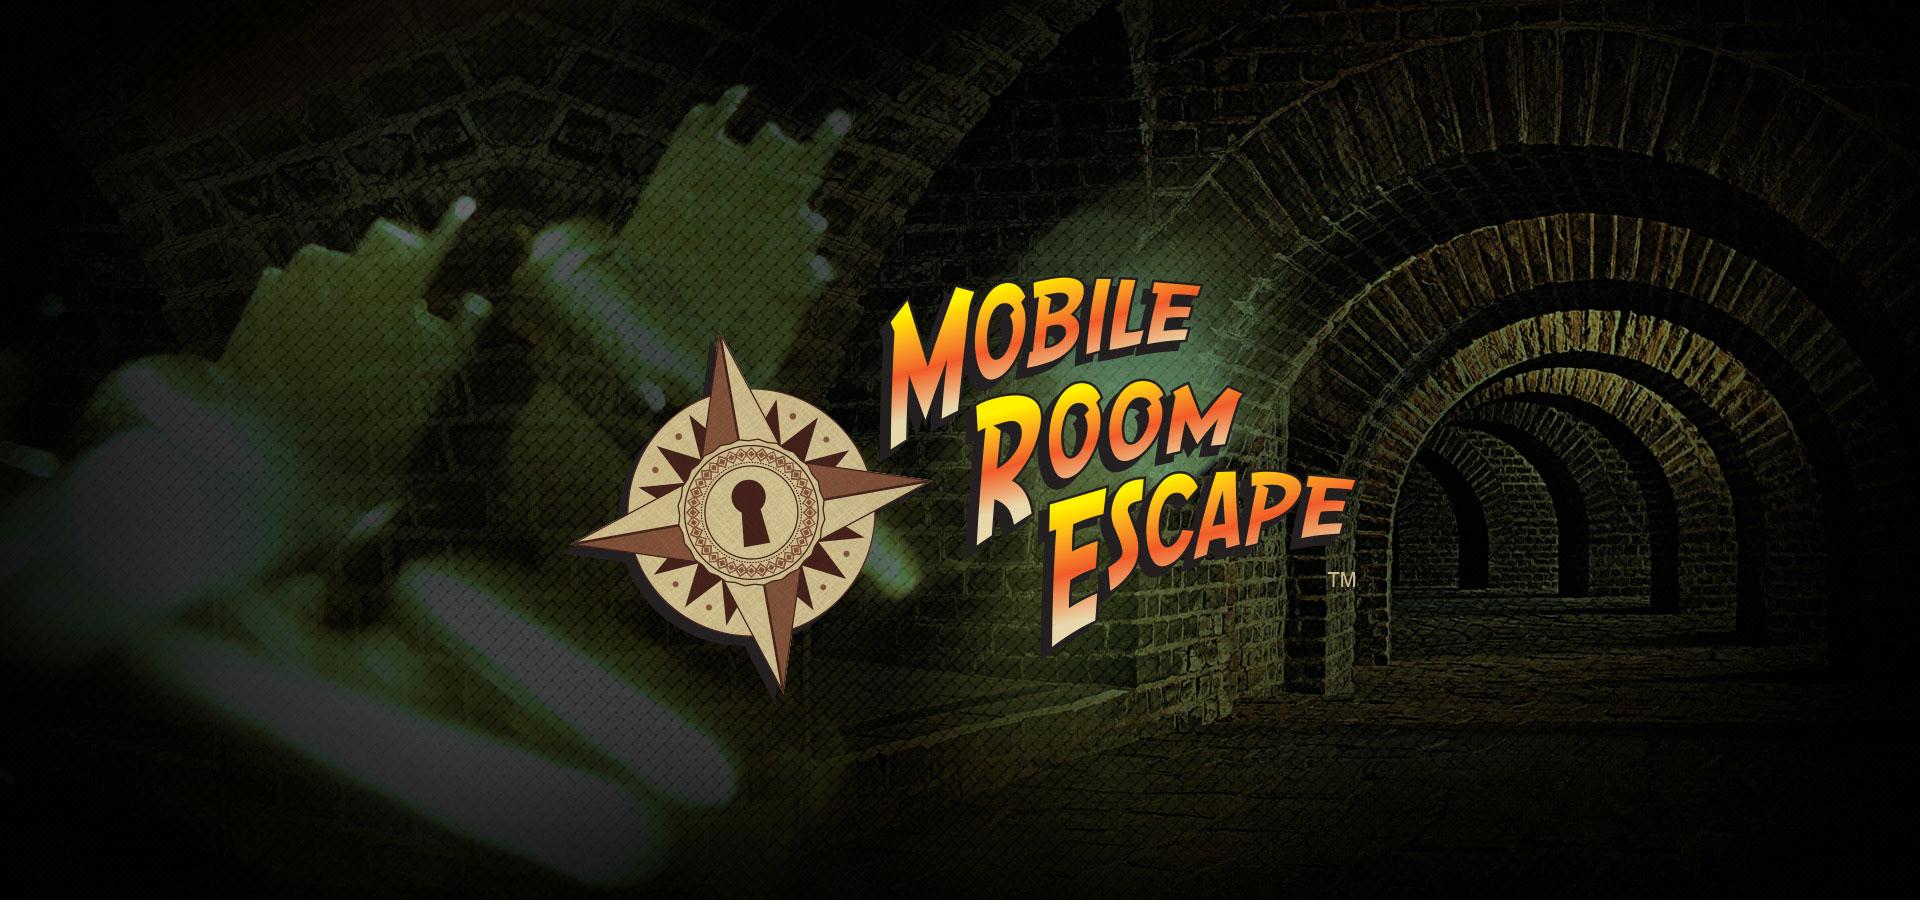 Chicago Escape Room | Mobile Room Escape Chicago